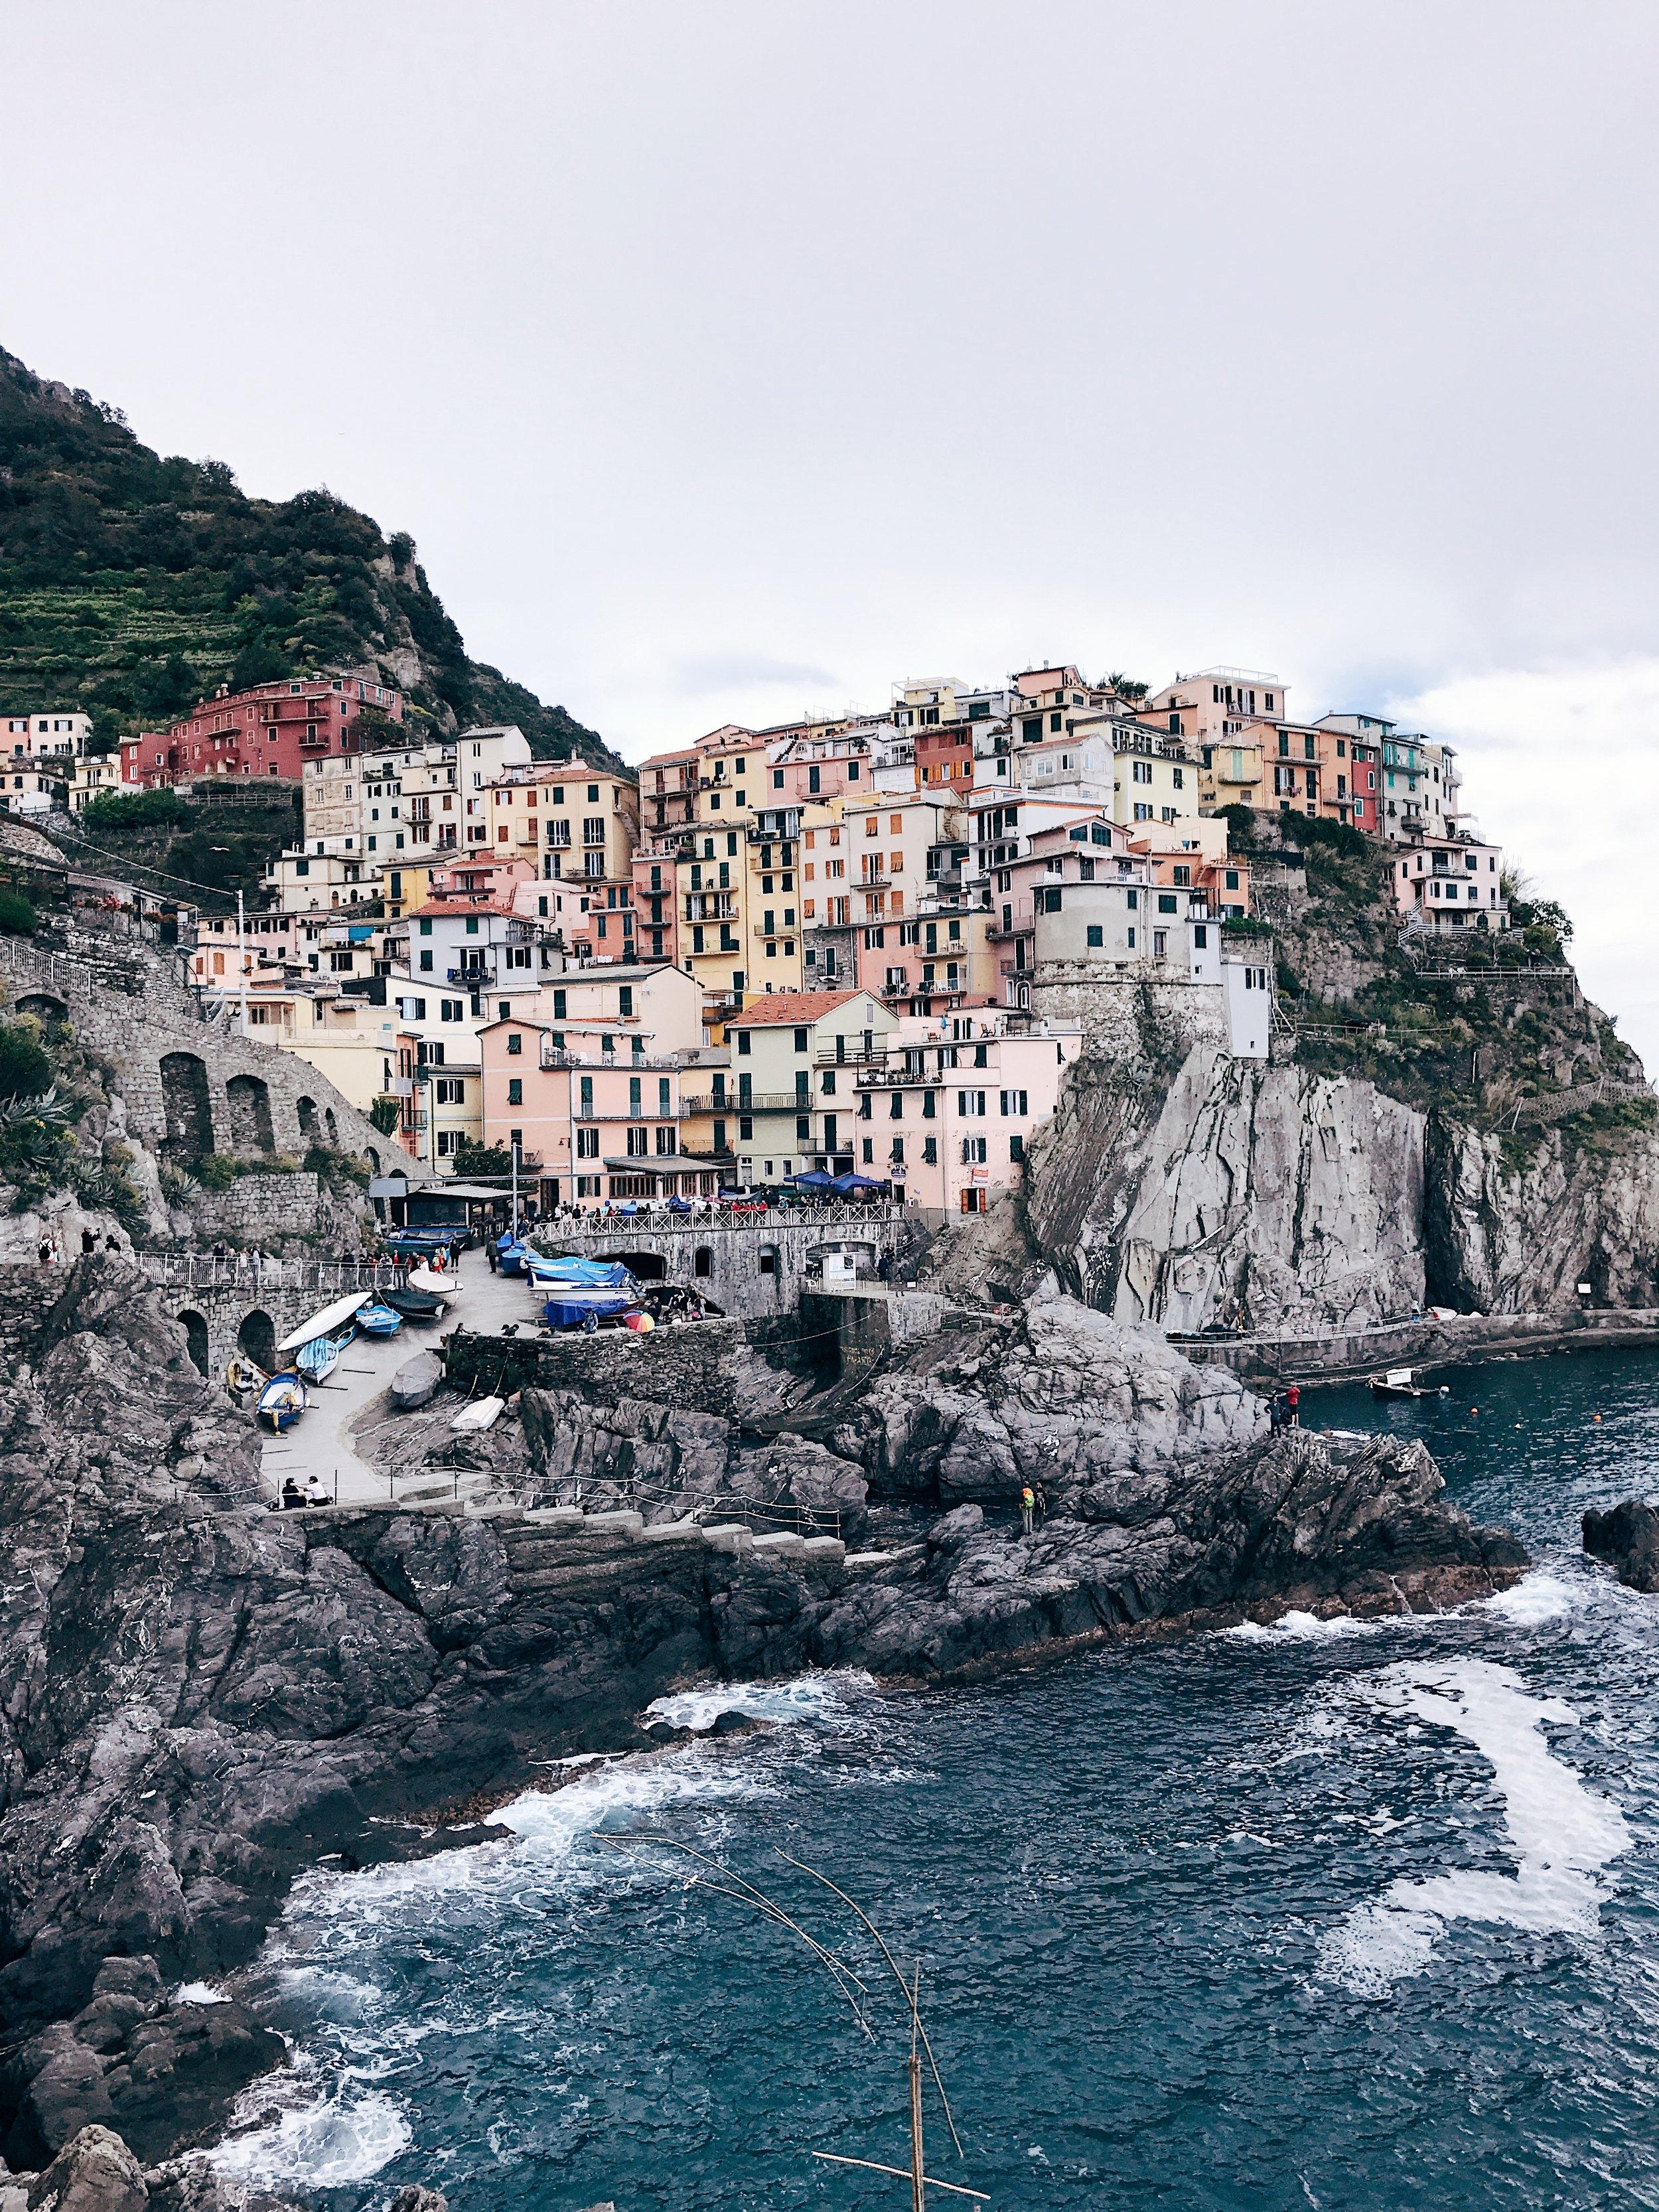 Image: Where to Travel in 2018 - Cinque Terre - Manarola